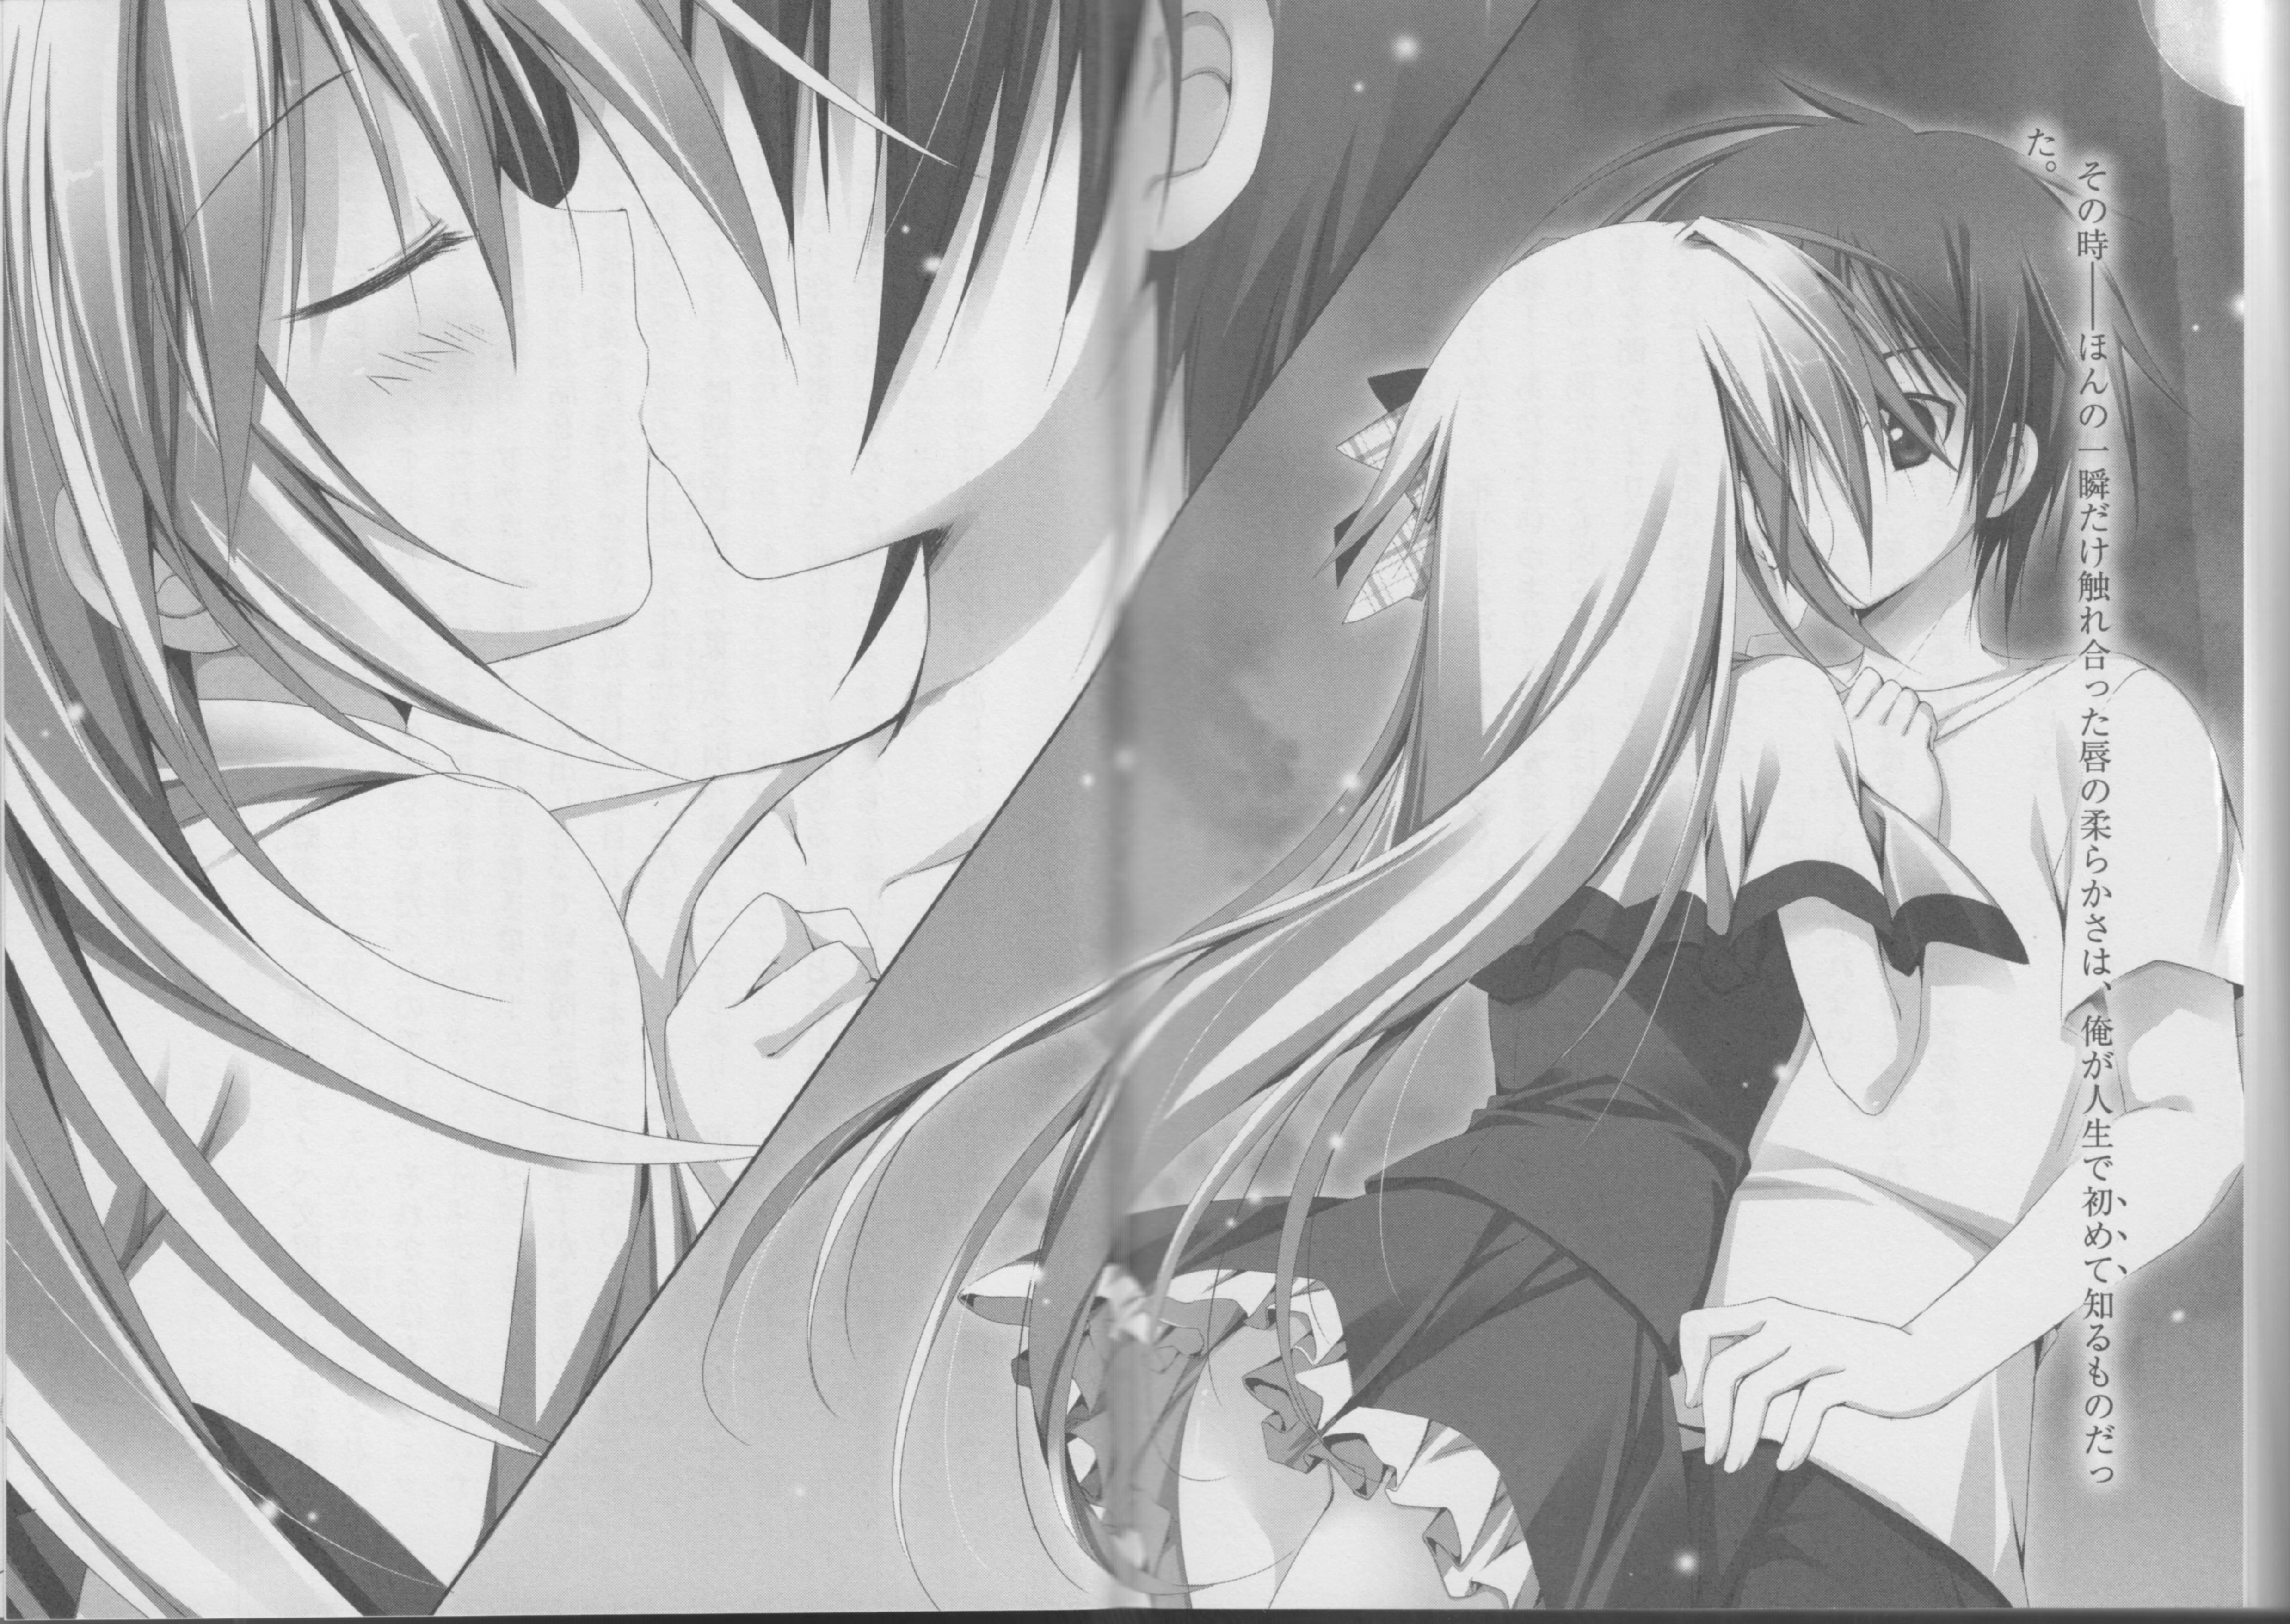 Juuou Mujin no Fafnir Vol 01.Phần kết